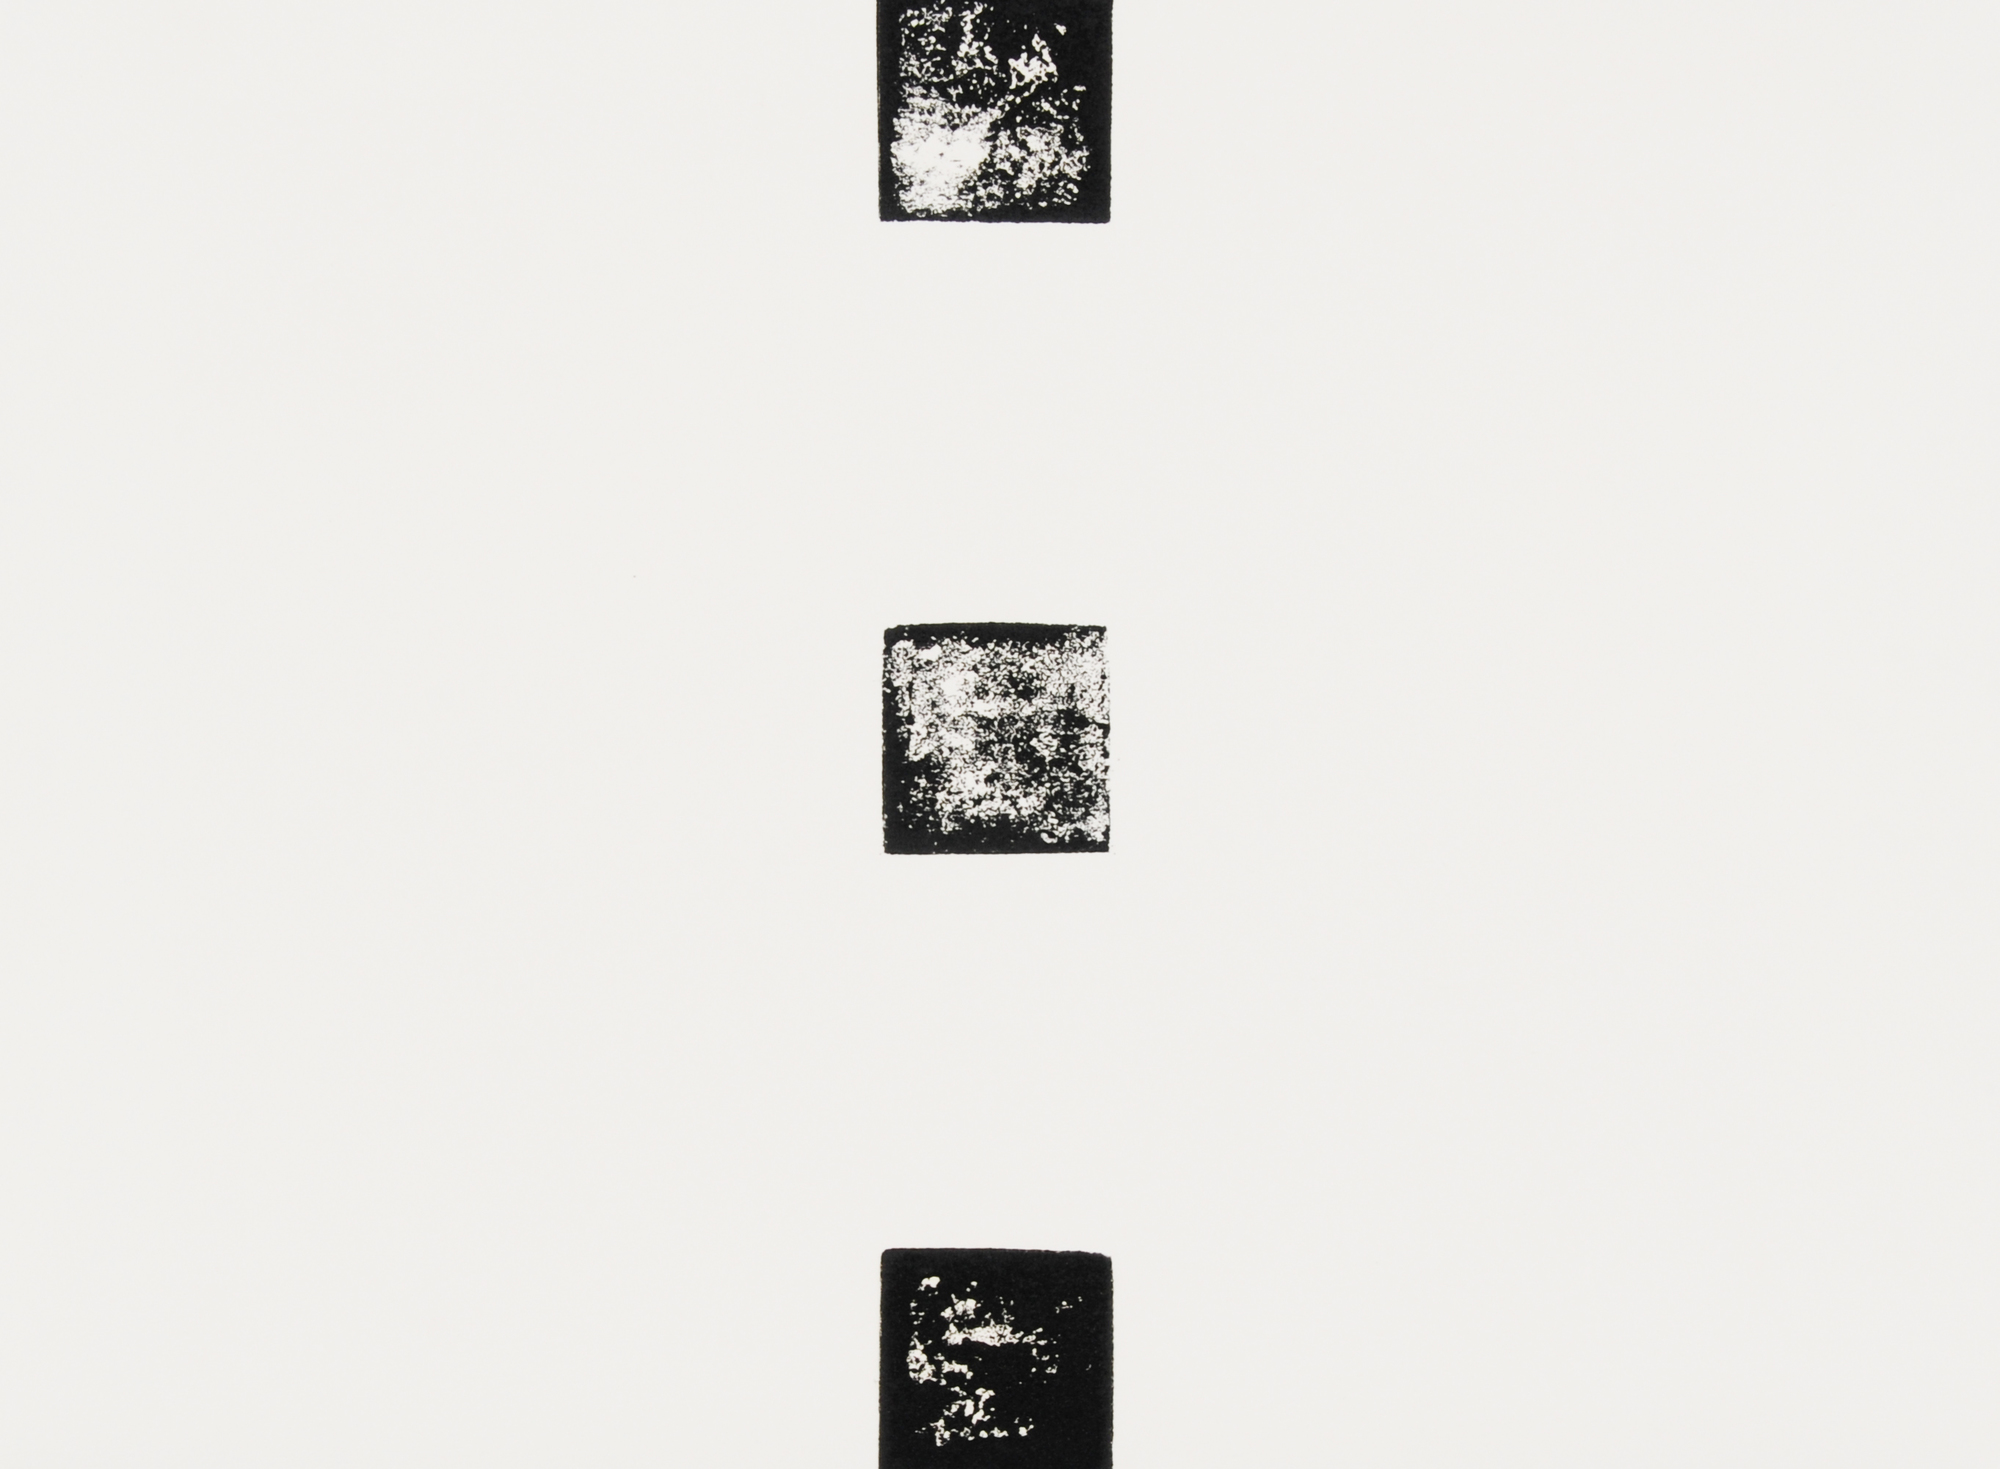 Gerritz Frank, Untitled